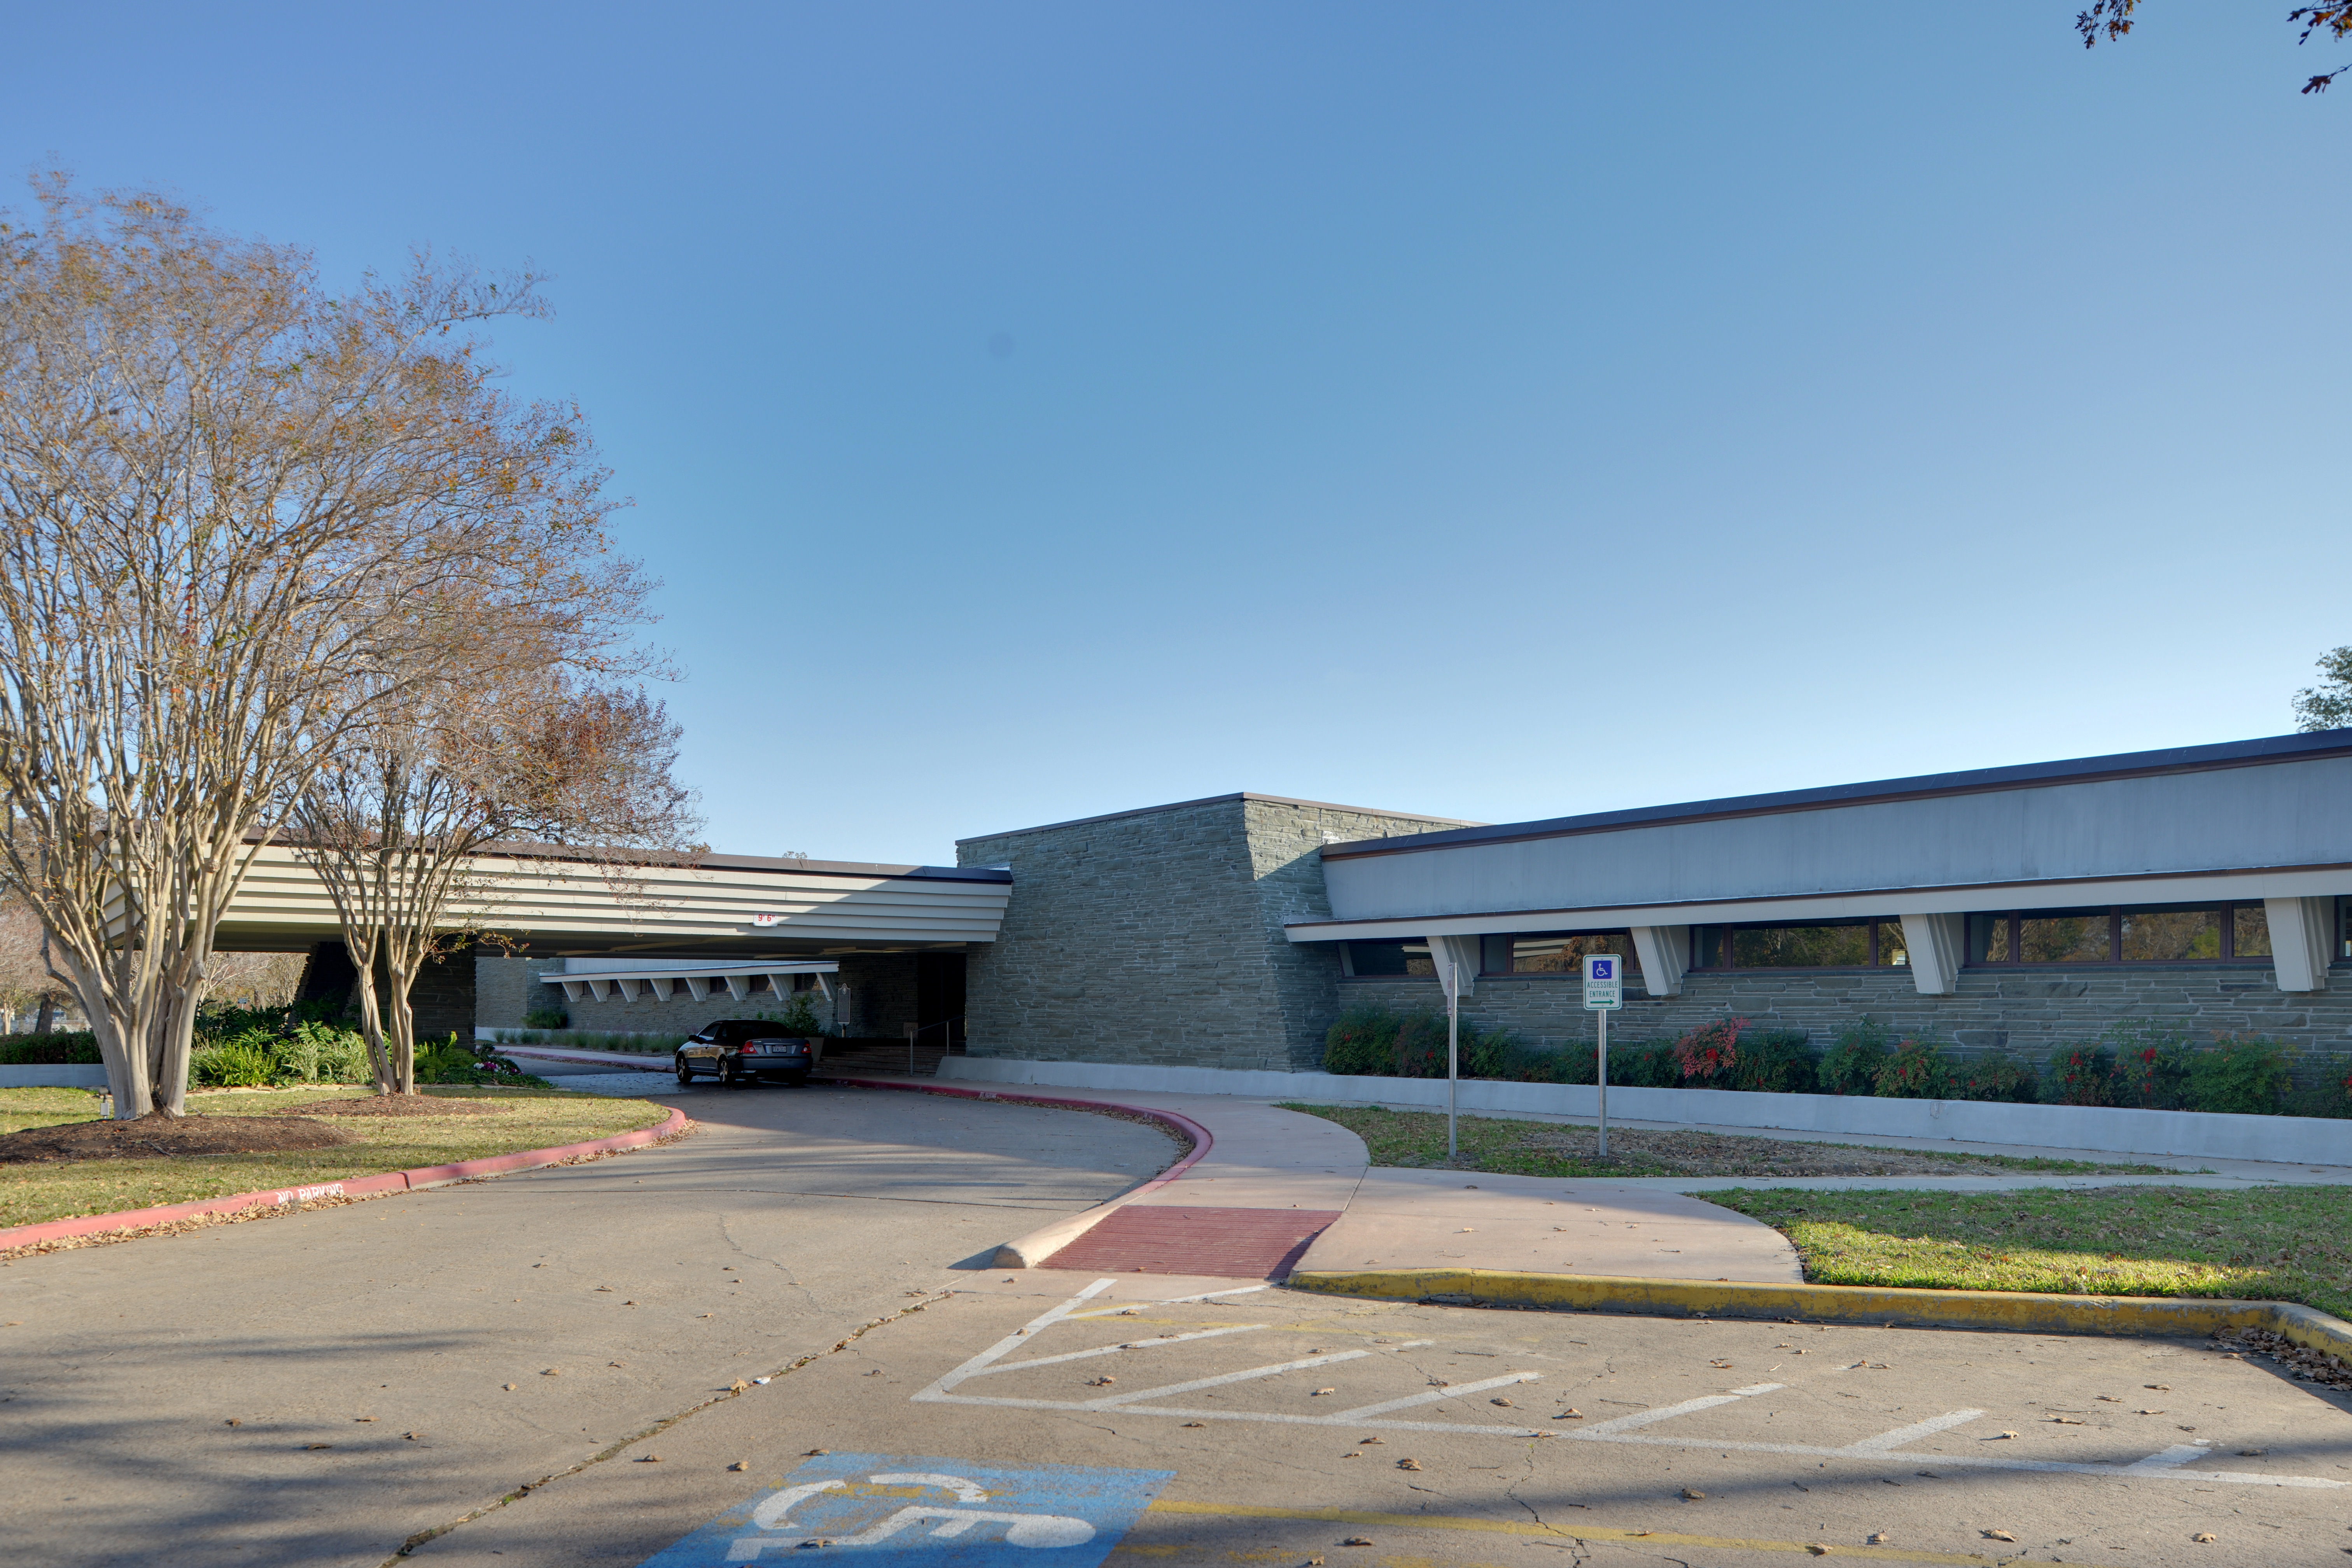 nasa houston space center address - photo #32